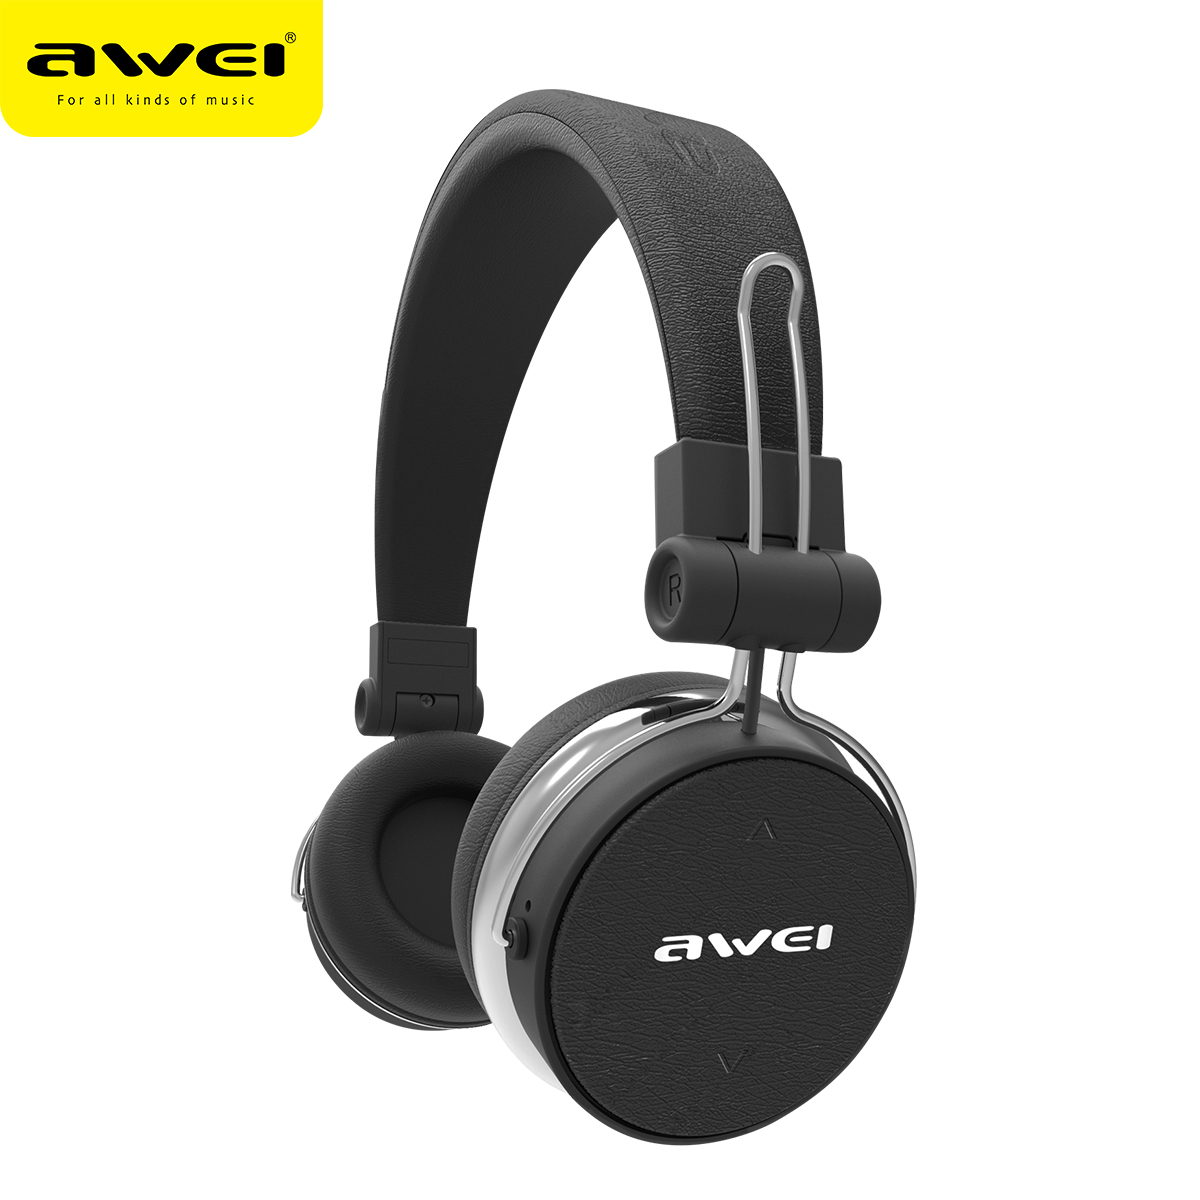 AWEI A700BL Auriculares Bluetooth con micrófono auricular inalámbrico estéreo Casque auricular Auriculares Kulakl k